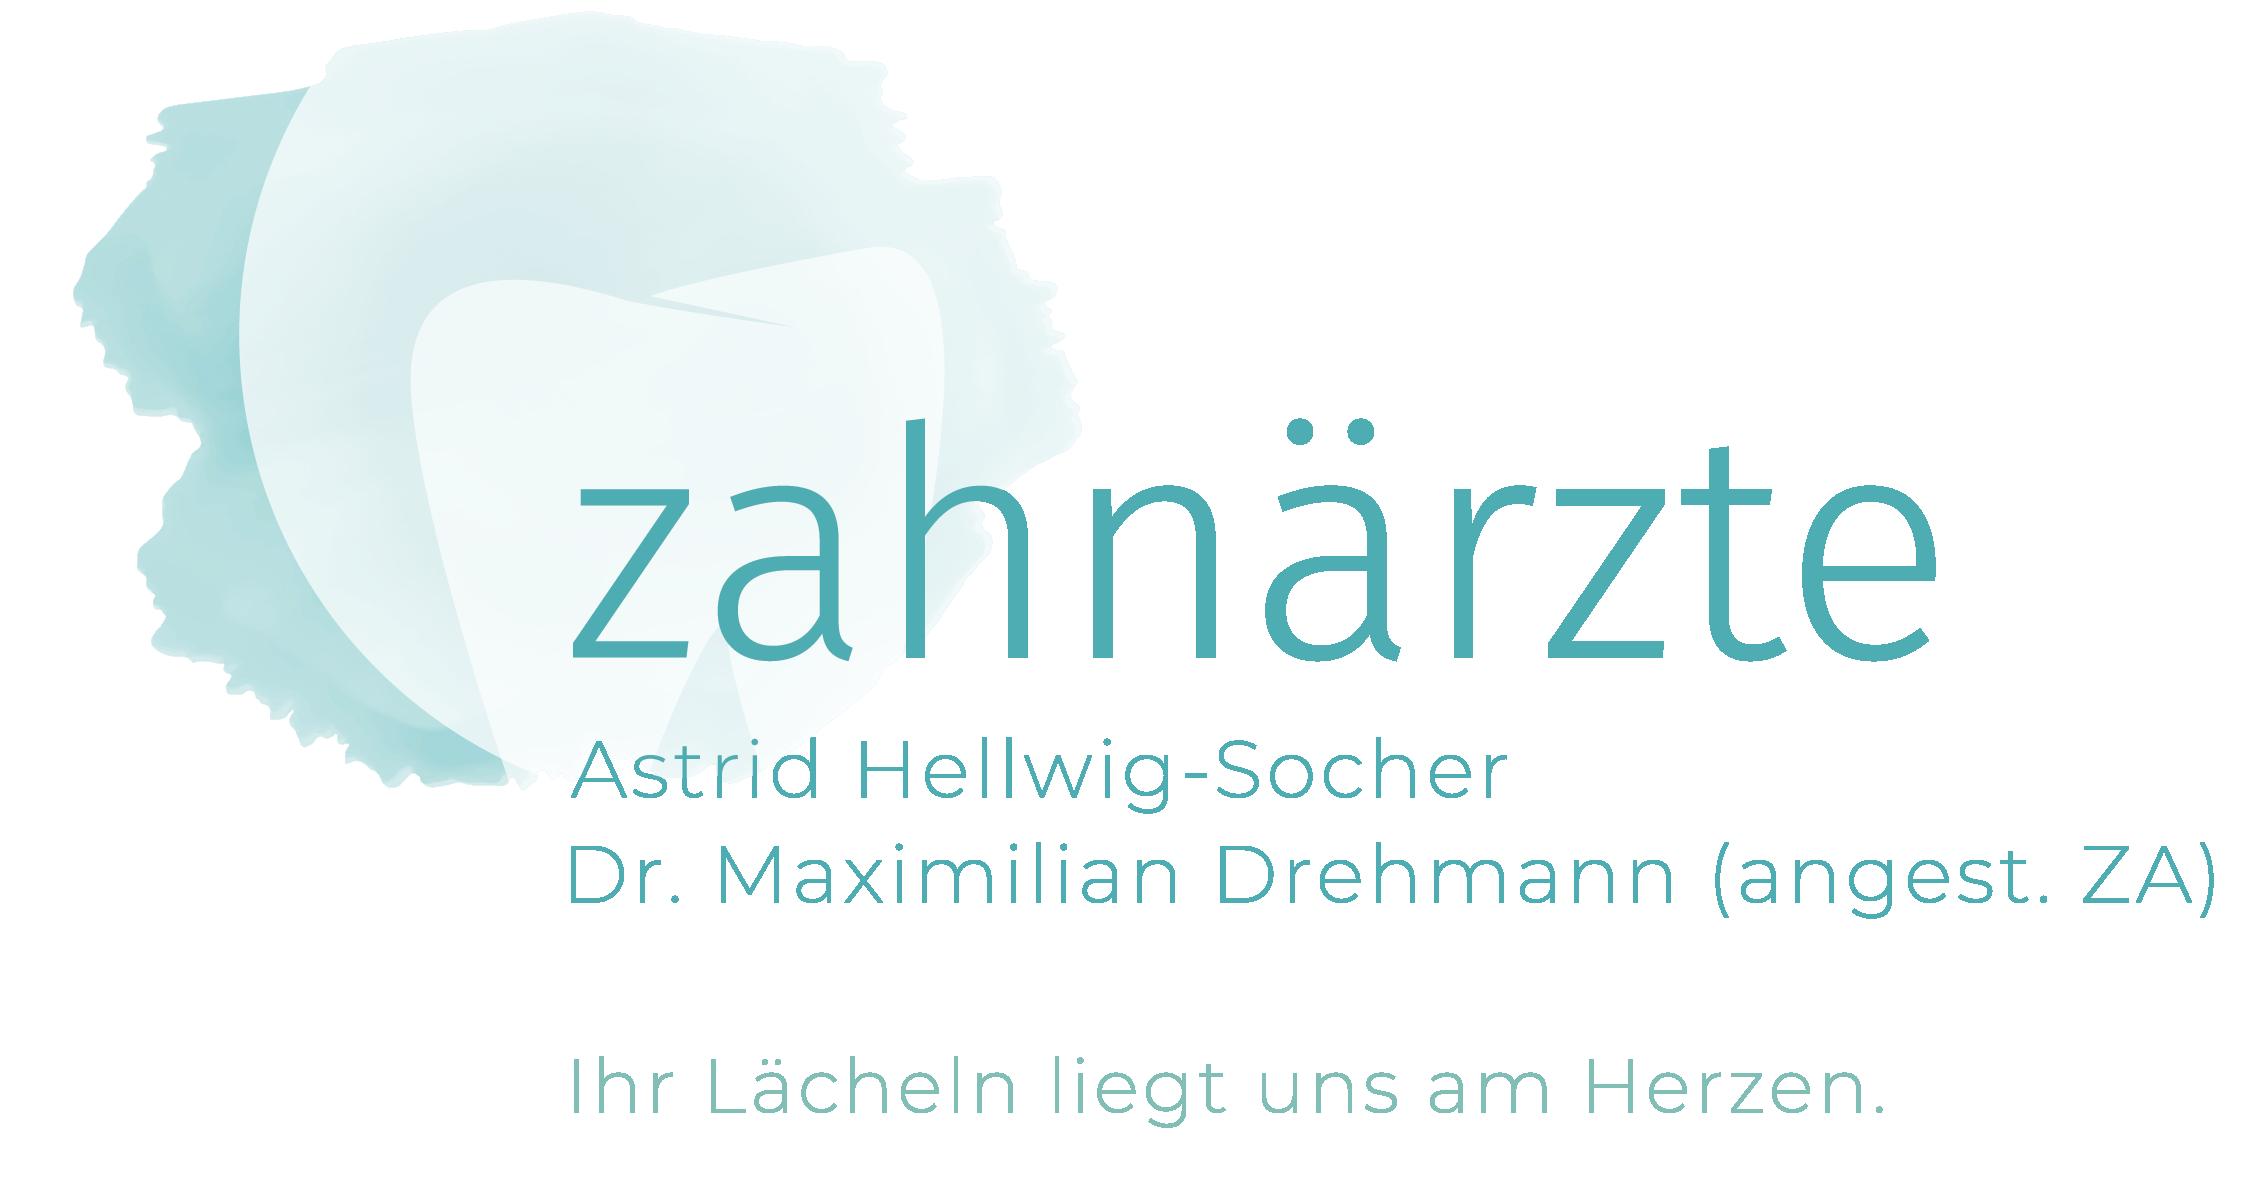 Zahnärzte Hellwig-Socher u. Dr. Drehmann